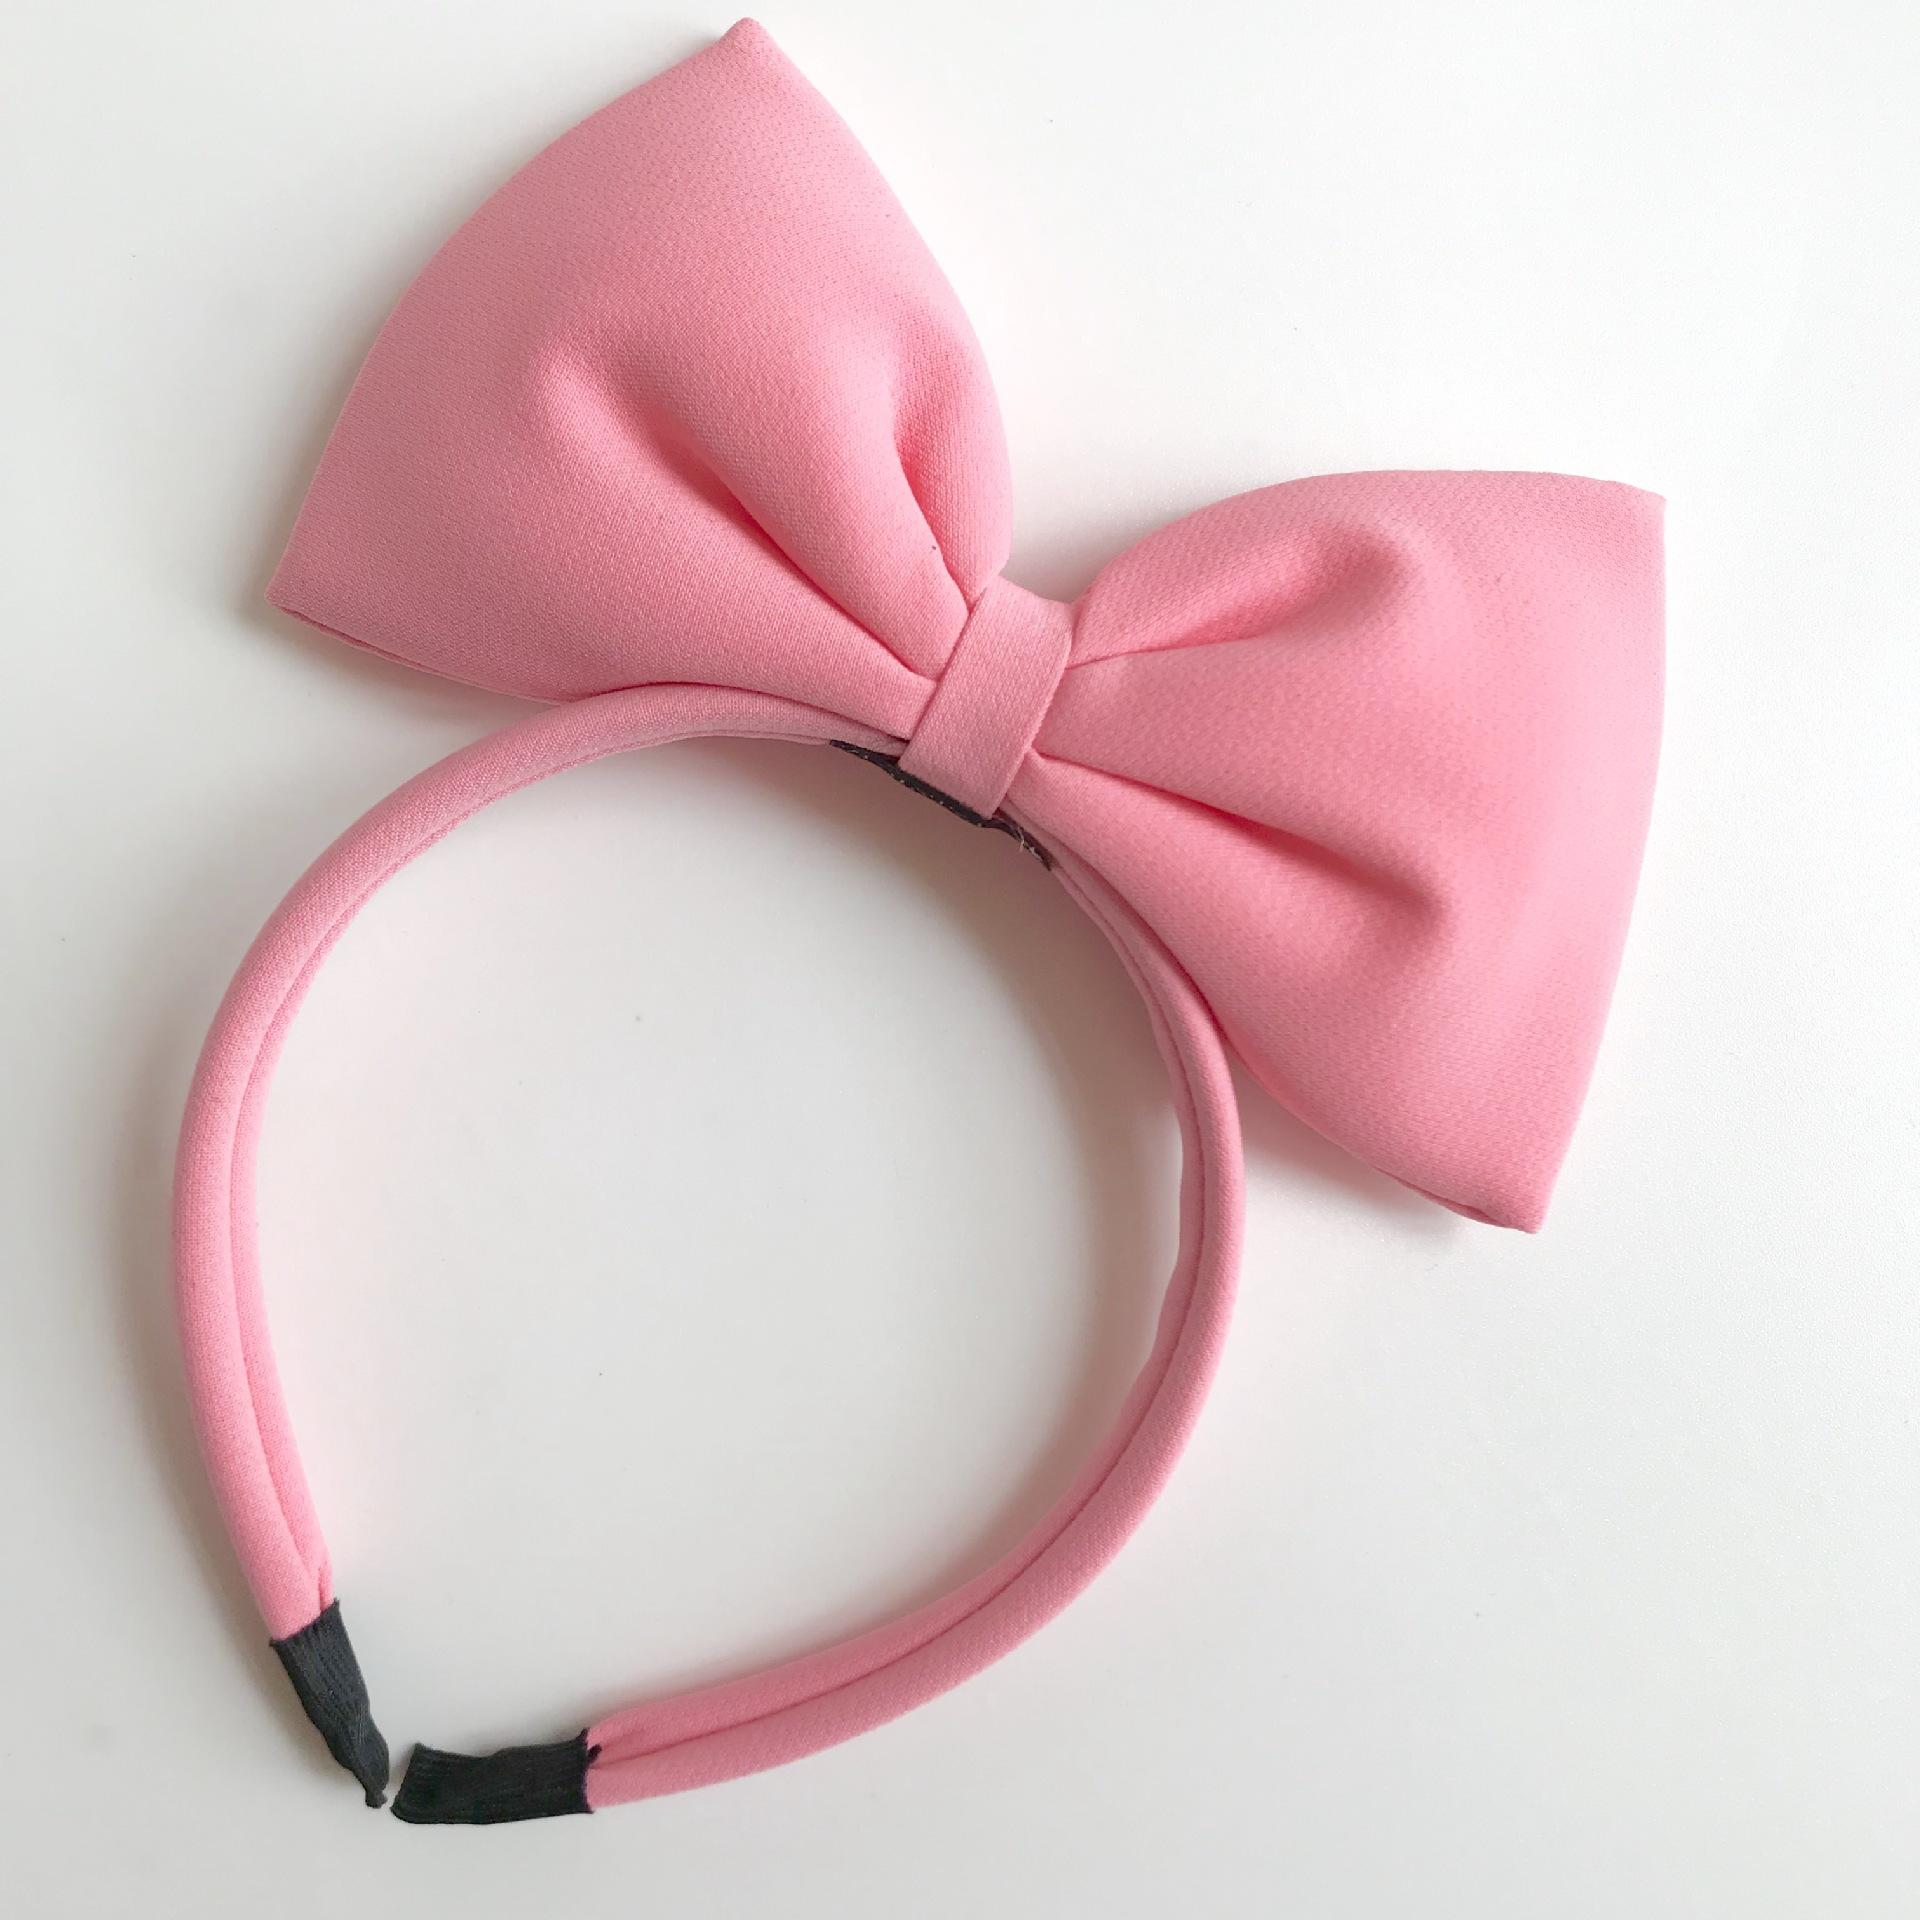 Girls' Clothing Boutique 20pcs Fashion Cute Lace Skirt Rabbit Hairpins Solid Kawaii Bowknot Bunny Hair Clips Princess Headwear Hair Accessories Hair Accessories